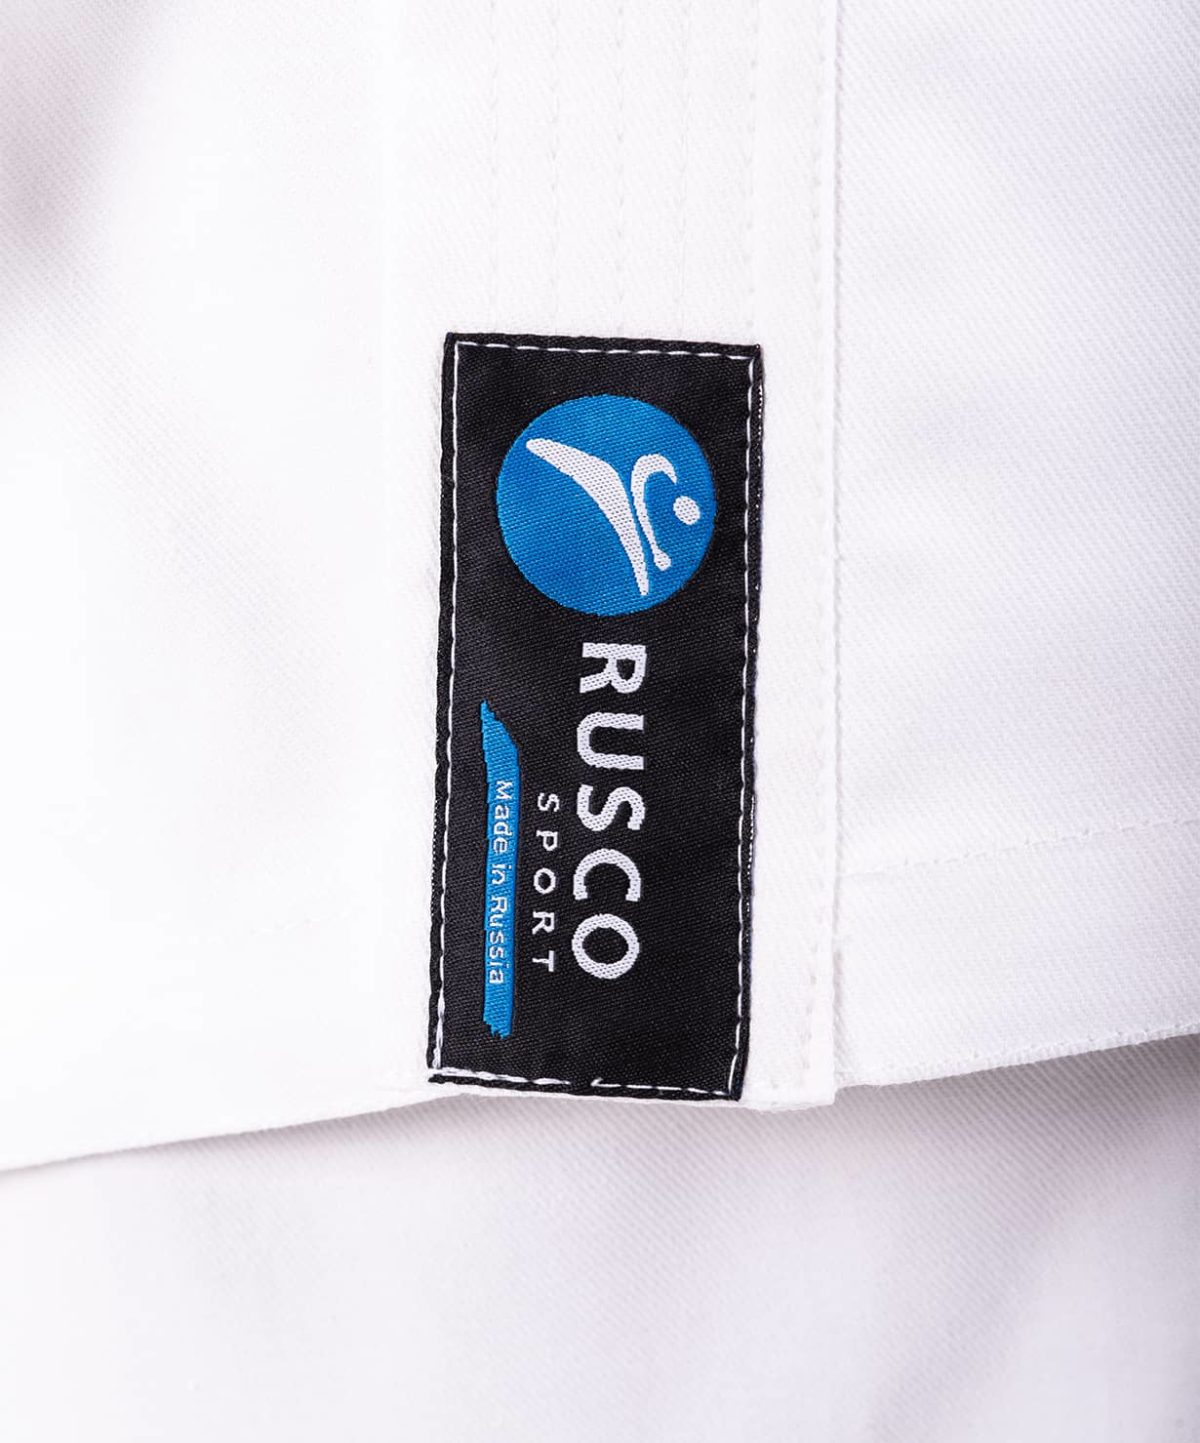 RUSCO Classic Кимано для рукопашного боя 0/130 17237 - 3